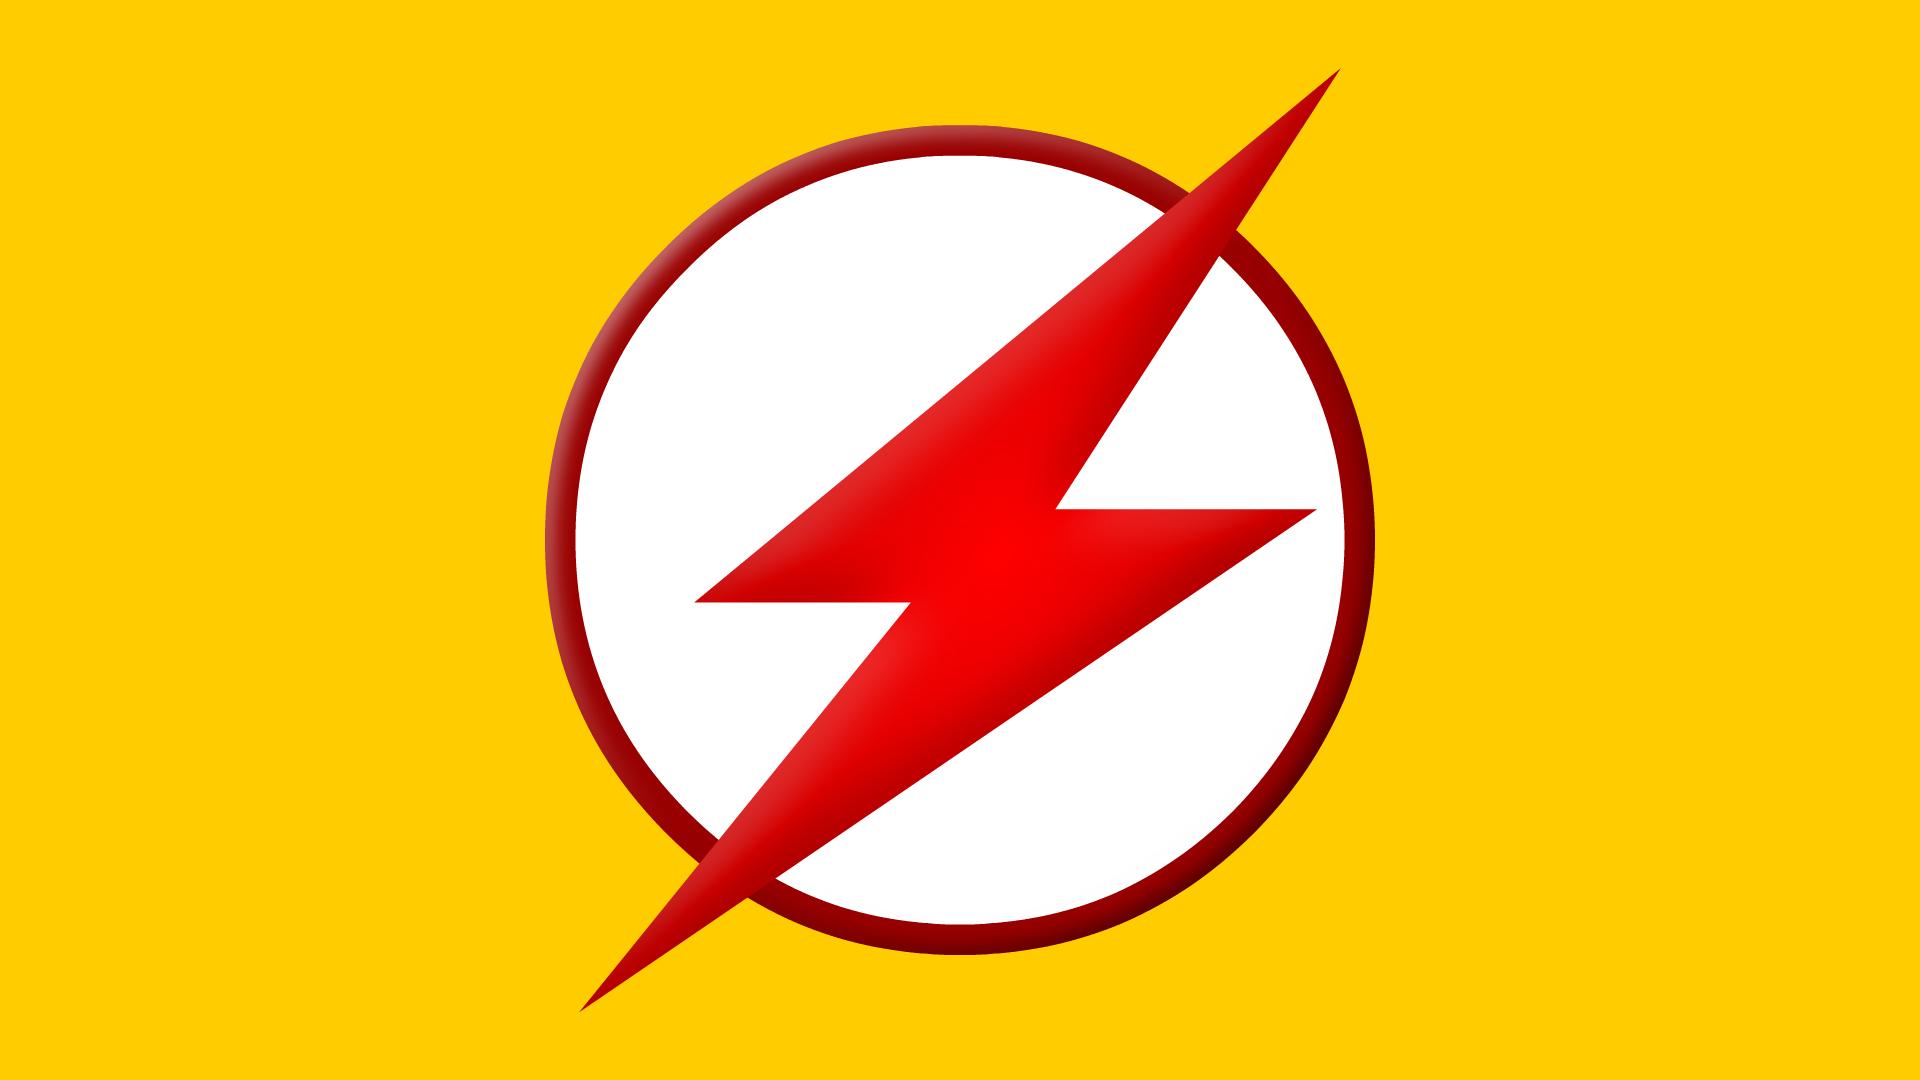 Kid Flash Symbol by Yurtigo on DeviantArt